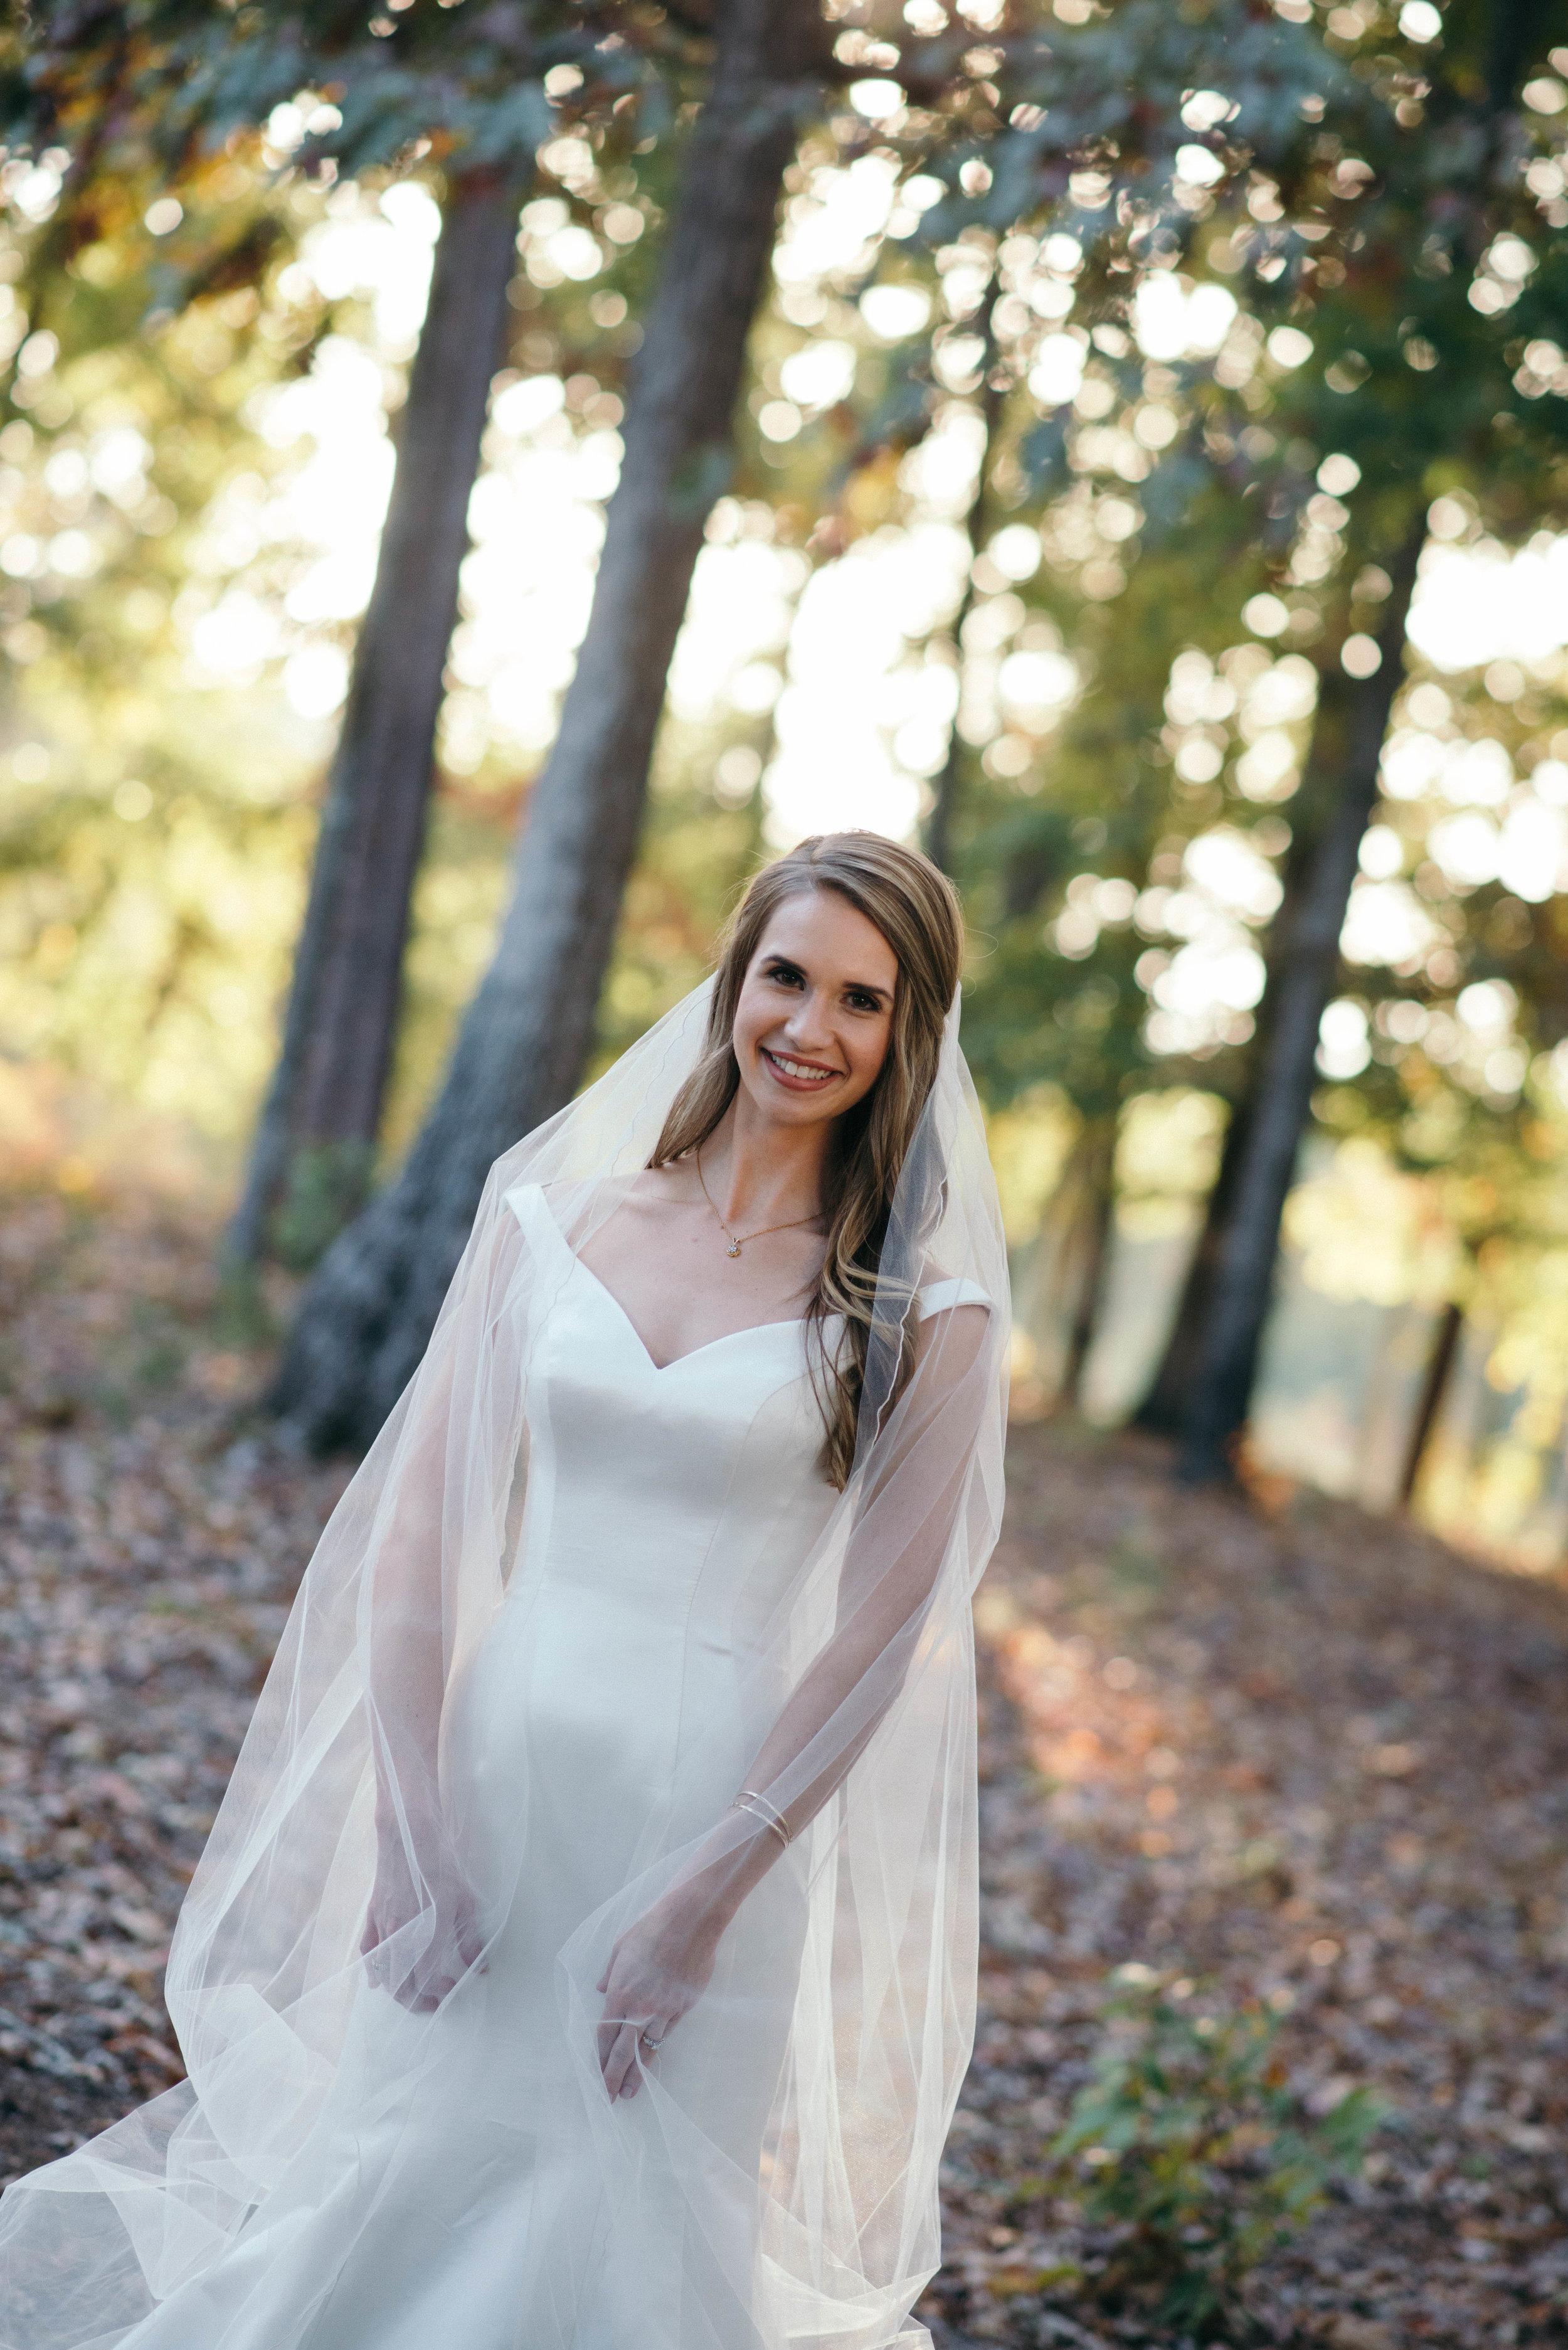 JuliaWilliams|Bridals|Color_MiraPhotographs-29.jpg